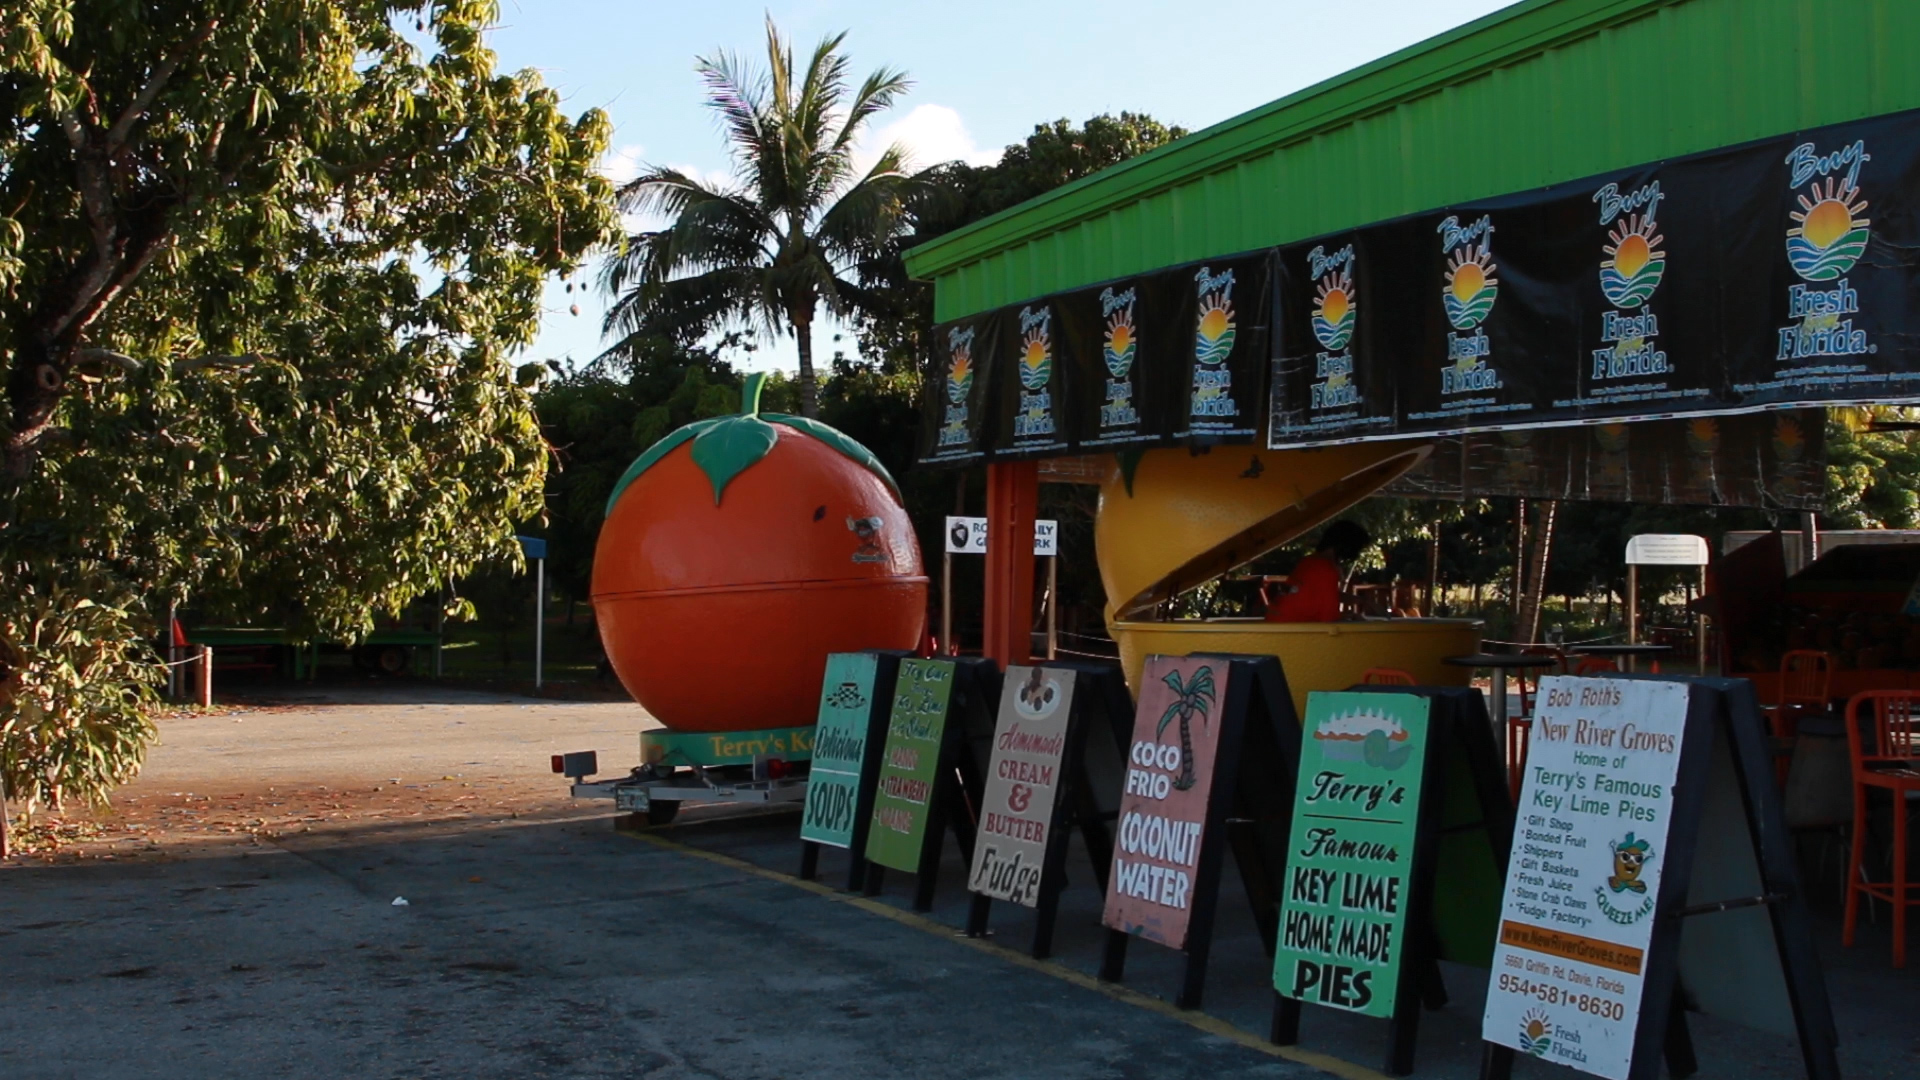 Bob Roth's New River Grove's famous Orange. Photo by: Justin Dalaba